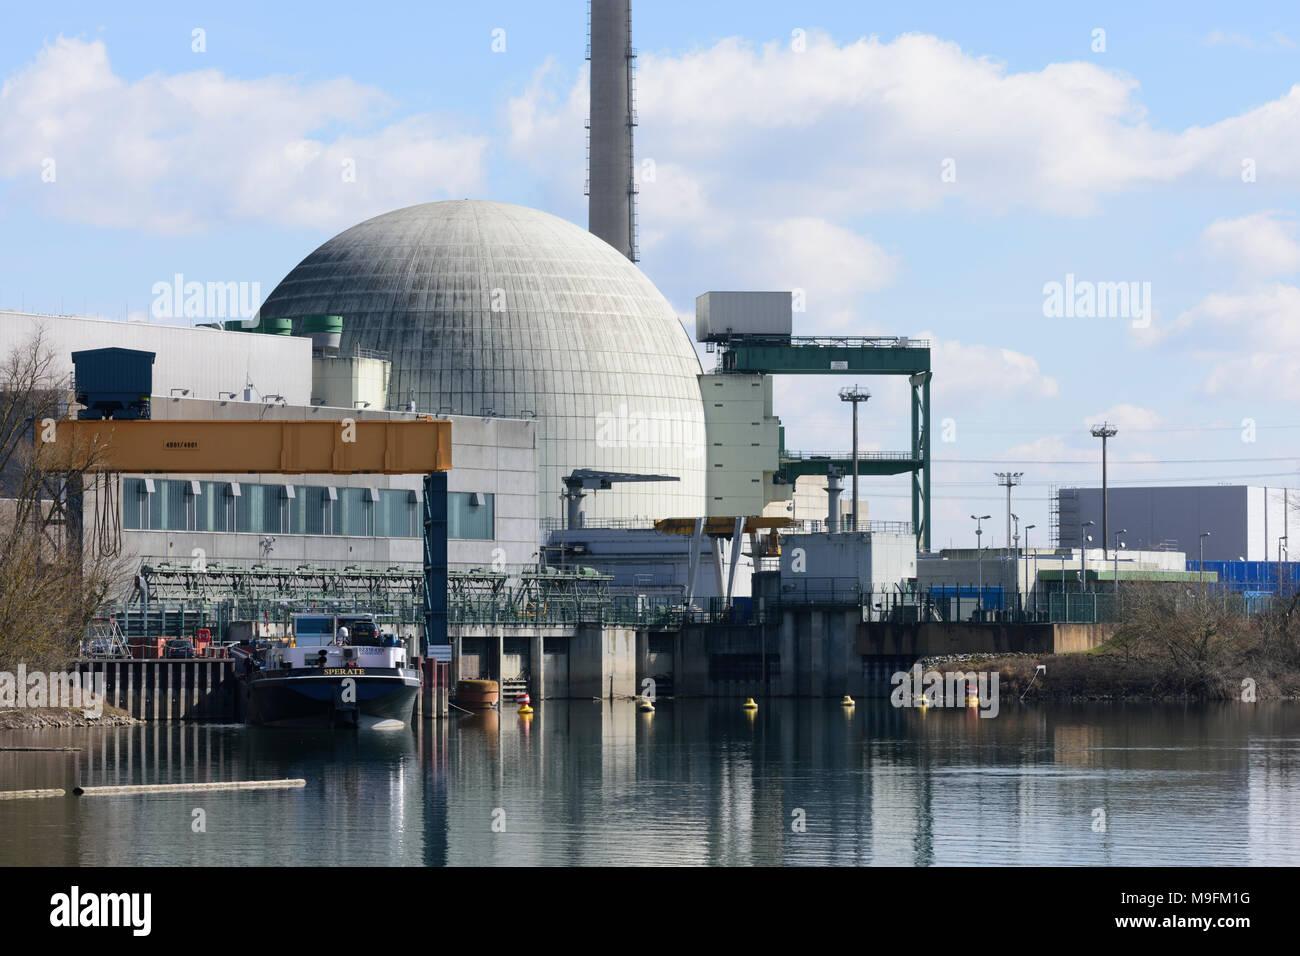 Philippsburg: Kernkraftwerk Nuclear power plant Philippsburg, oxbow lake Philippsburger Altrhein, Kraichgau-Stromberg, Baden-Württemberg, Germany - Stock Image